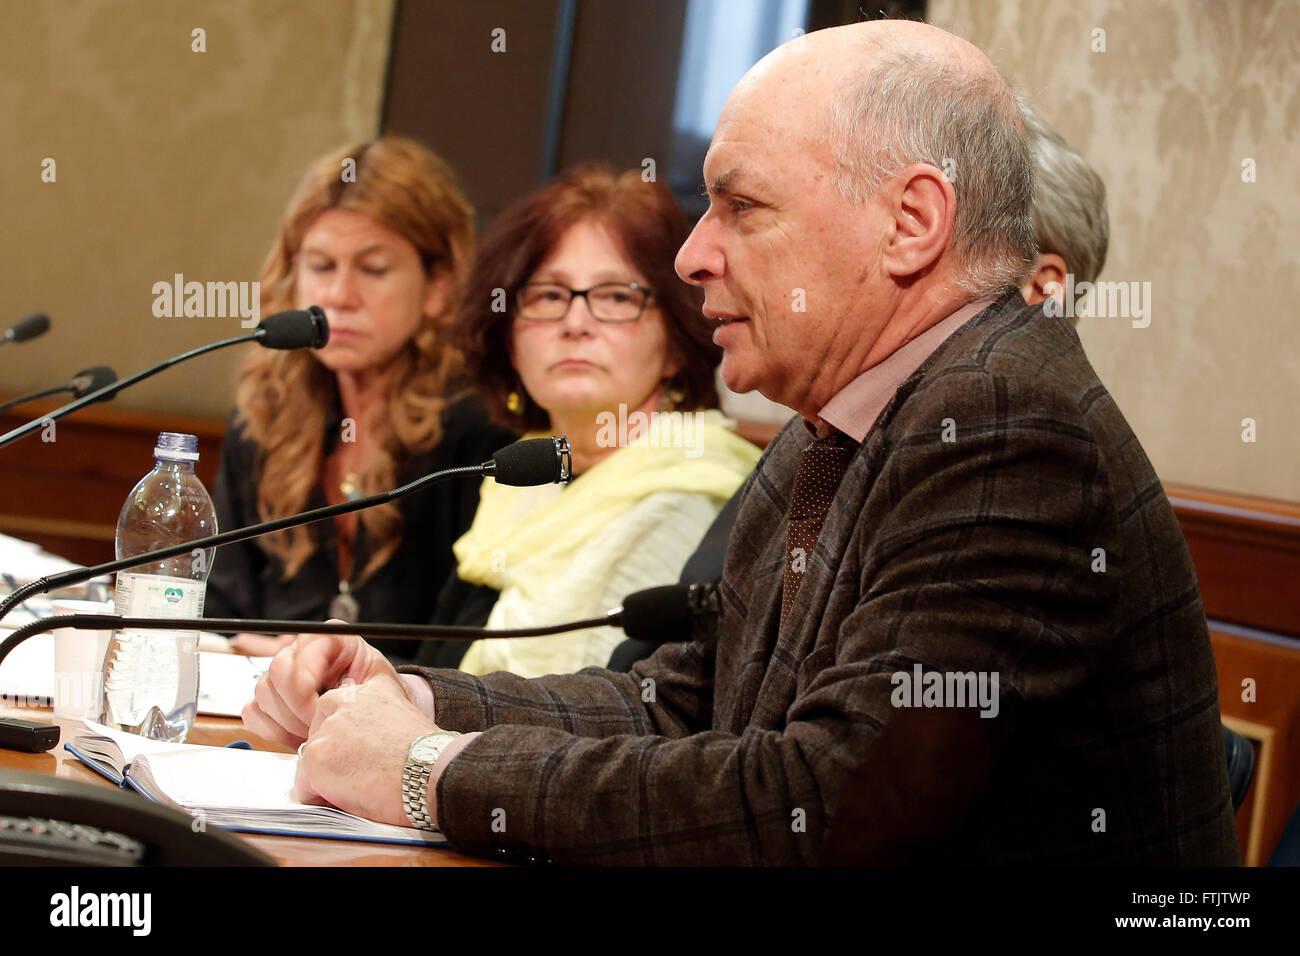 Rome, Italy. 29th March, 2016.  Press conference of Giulio Regeni's parents. Giulio Regeni, was an Italian student, - Stock Image